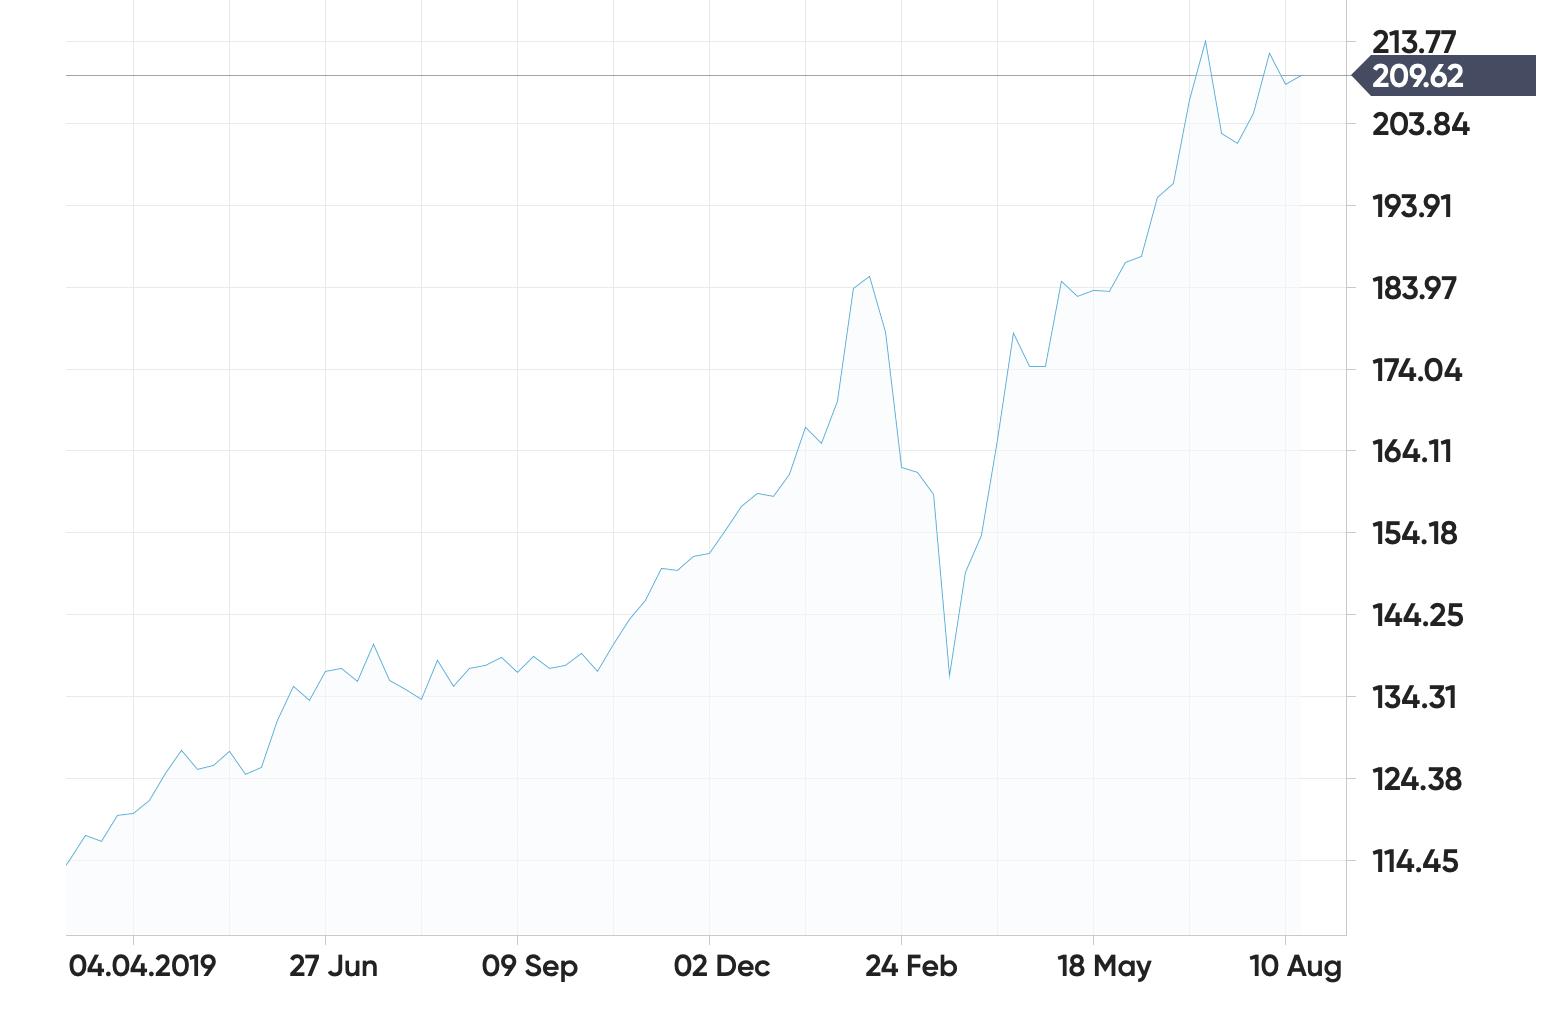 Graph showing Microsoft's increase in revenue in 2020